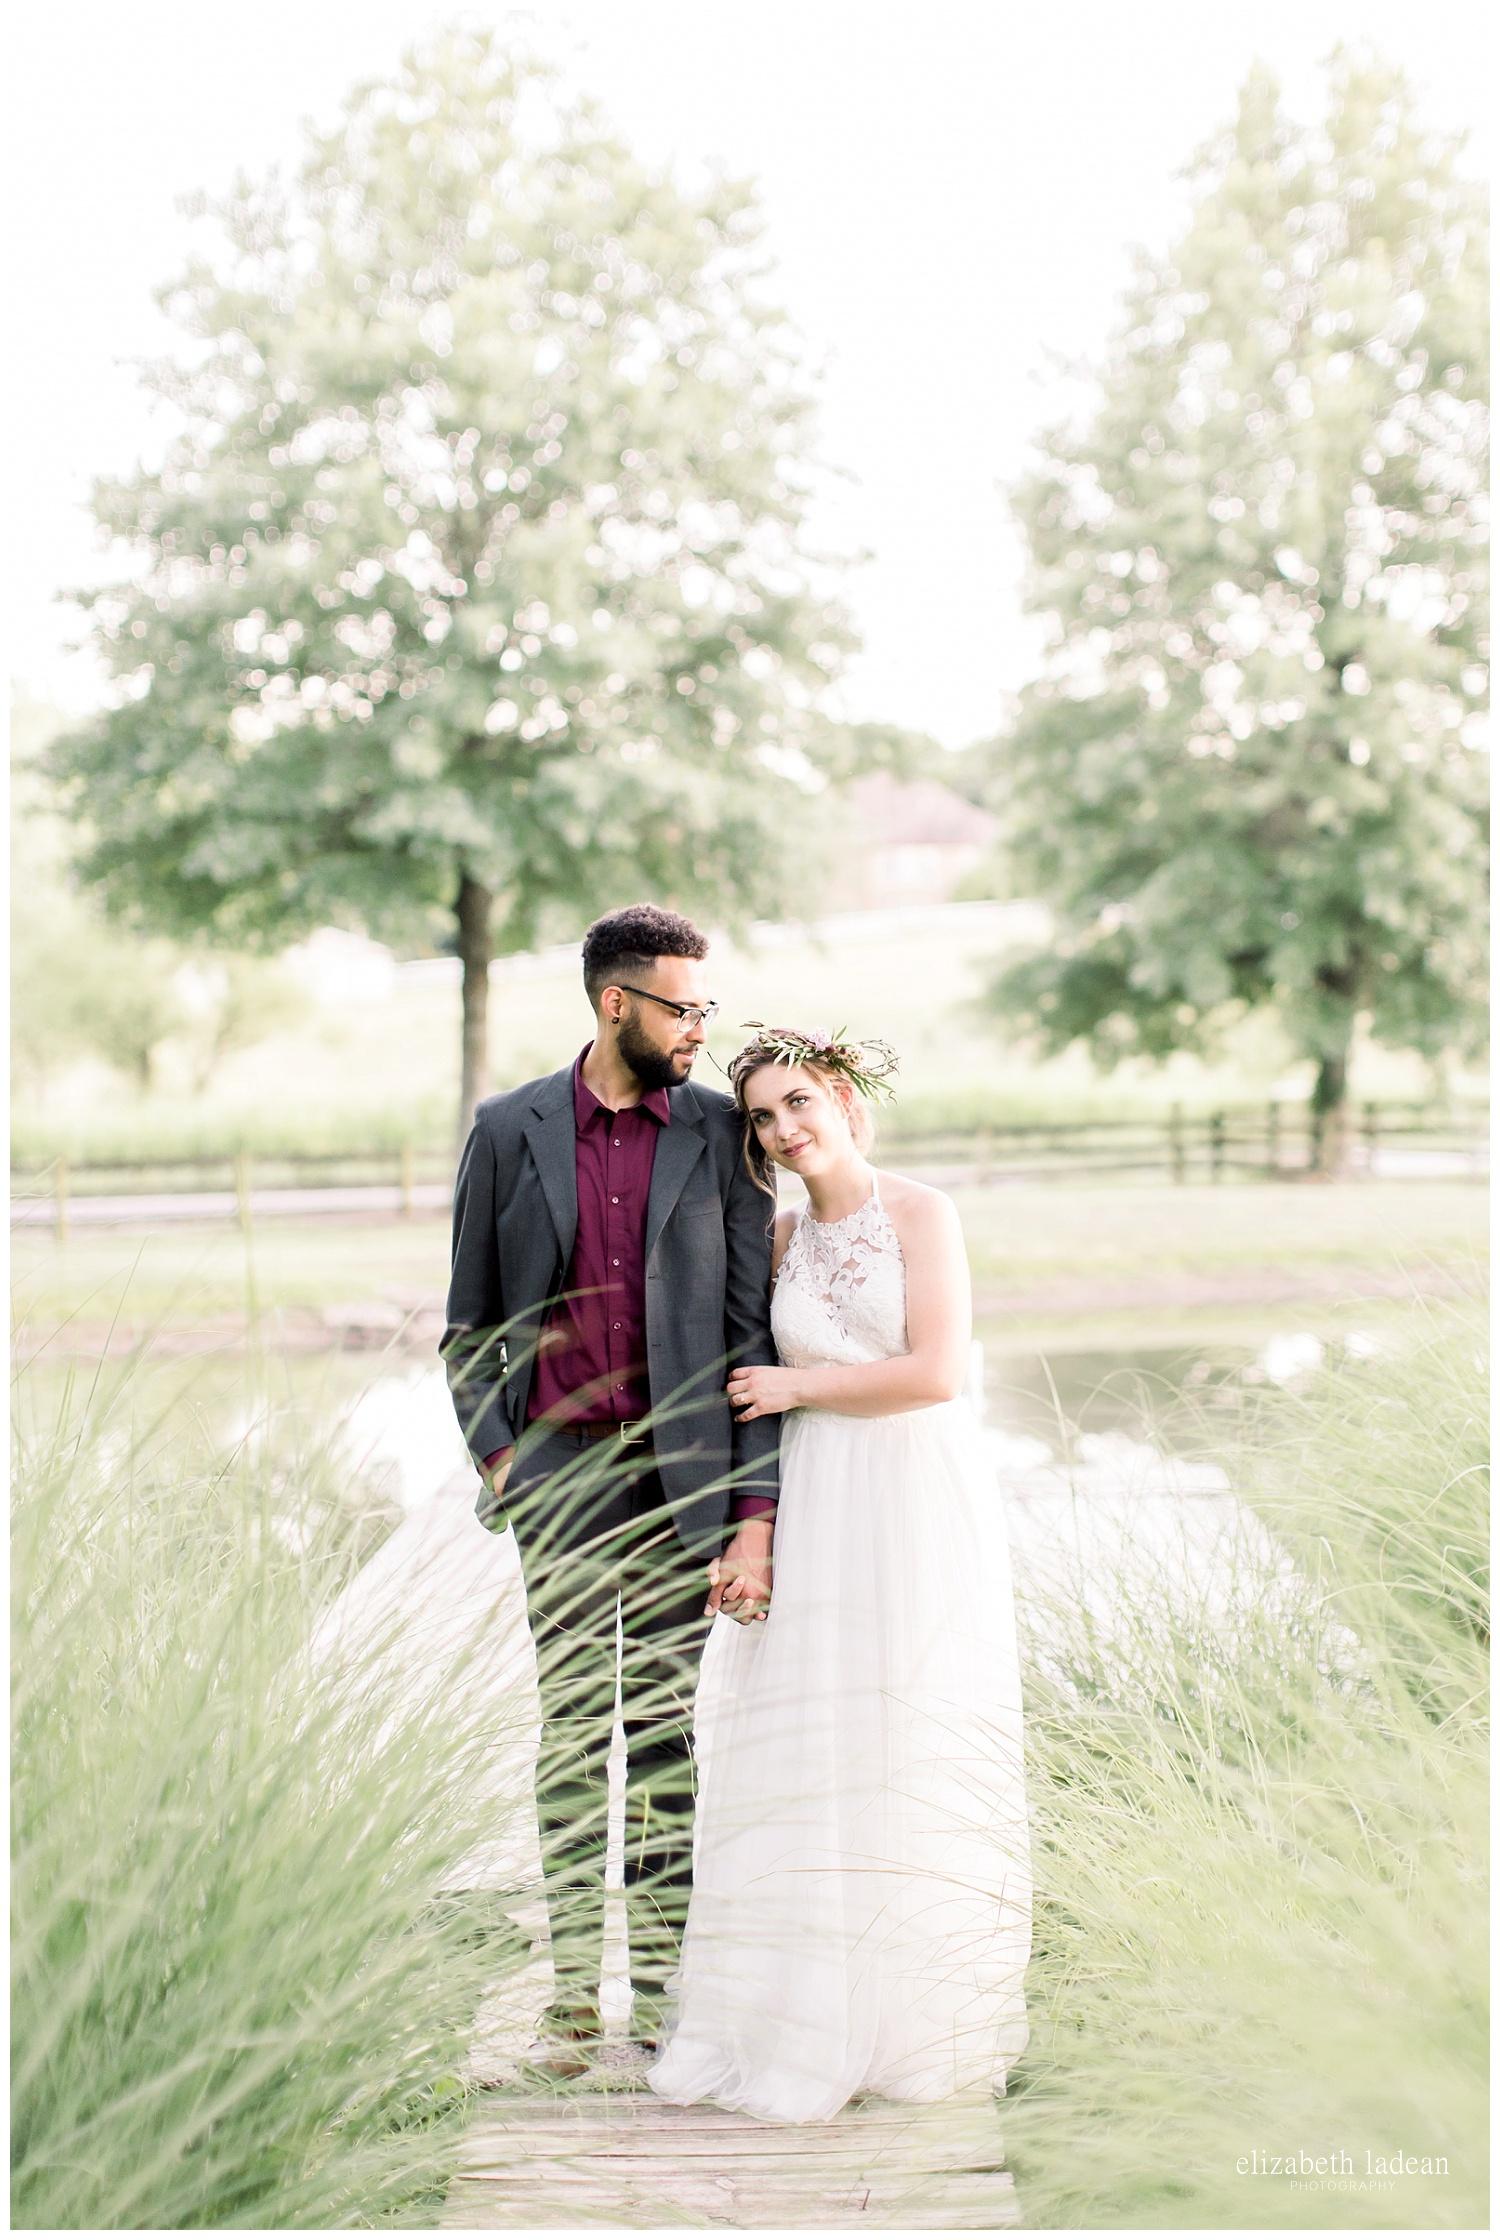 Modern-Woodland-Style-Wedding-Barn-at-Riverbend-June2018-elizabeth-ladean-photography-photo-_9209.jpg